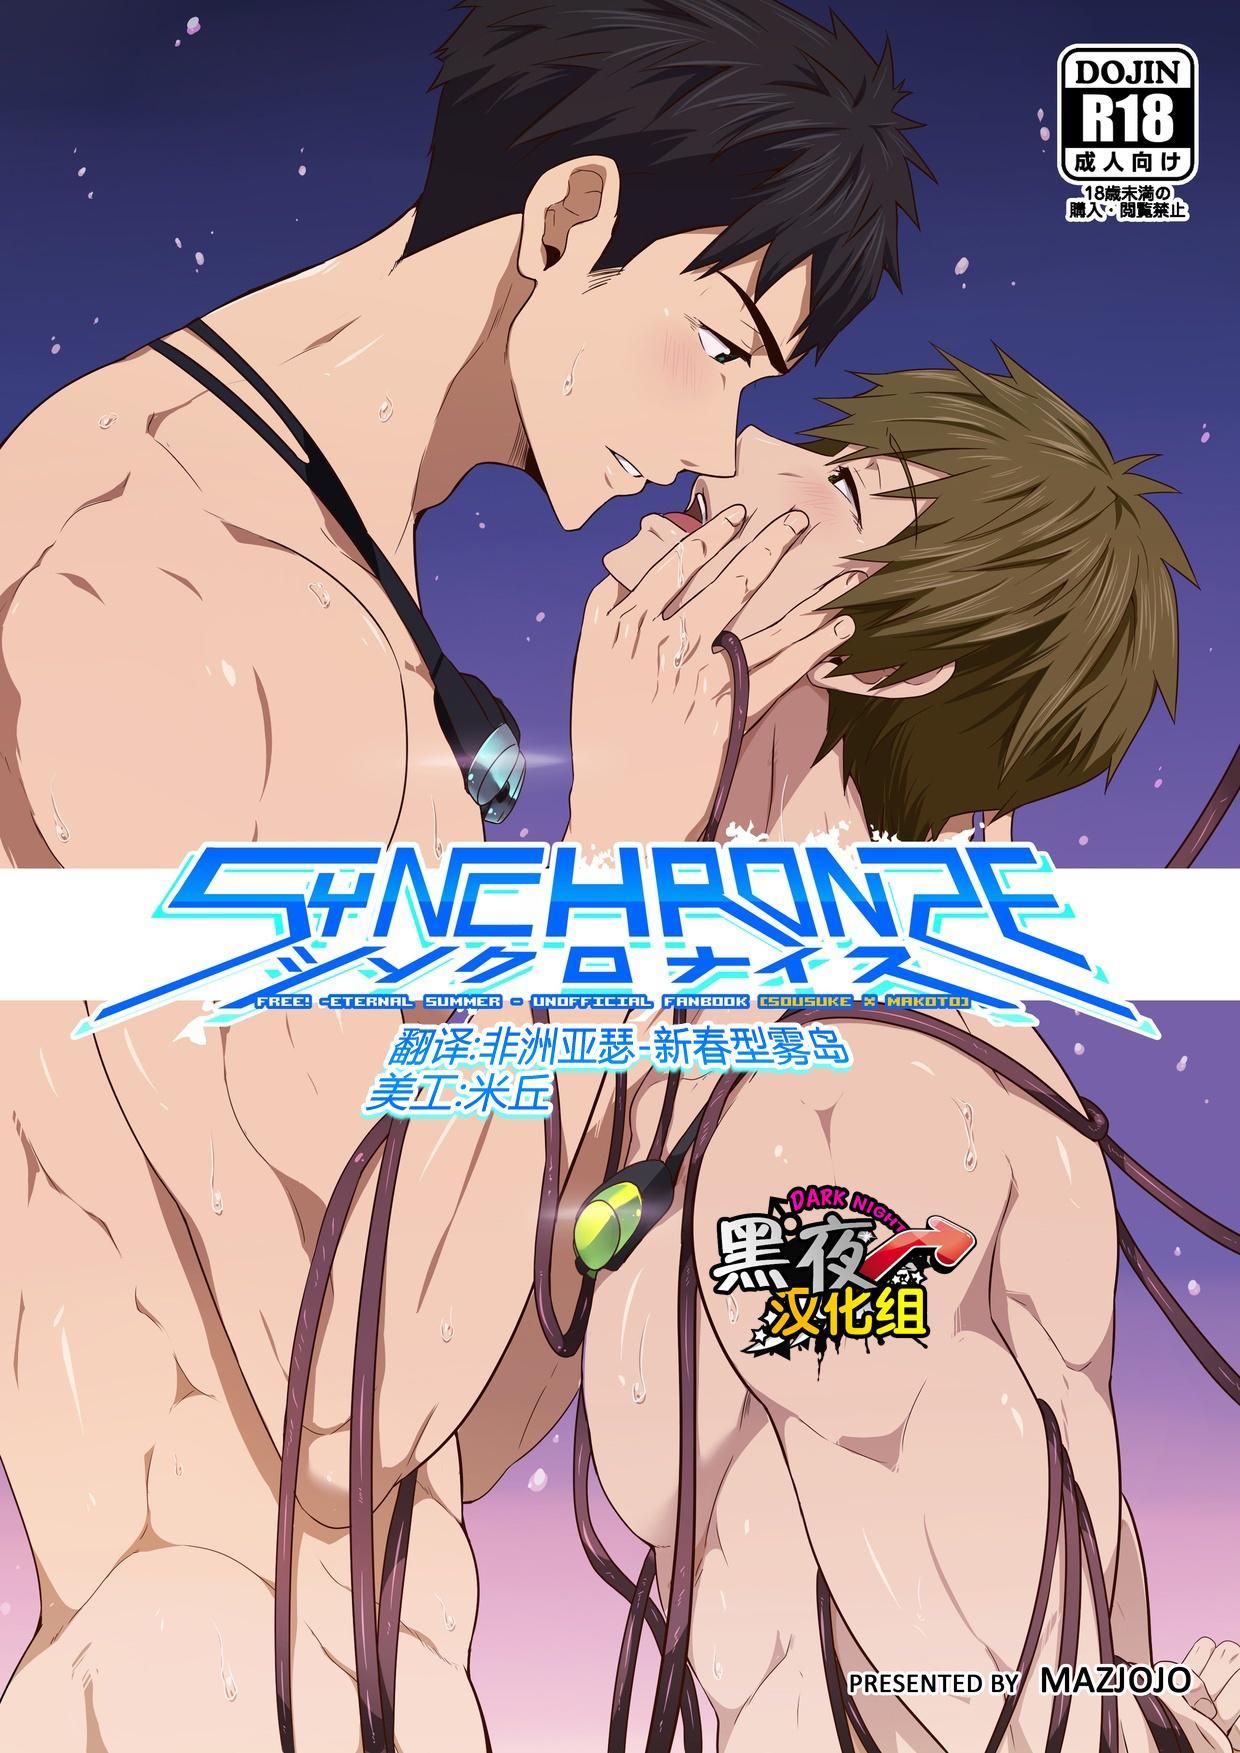 Synchronize 0